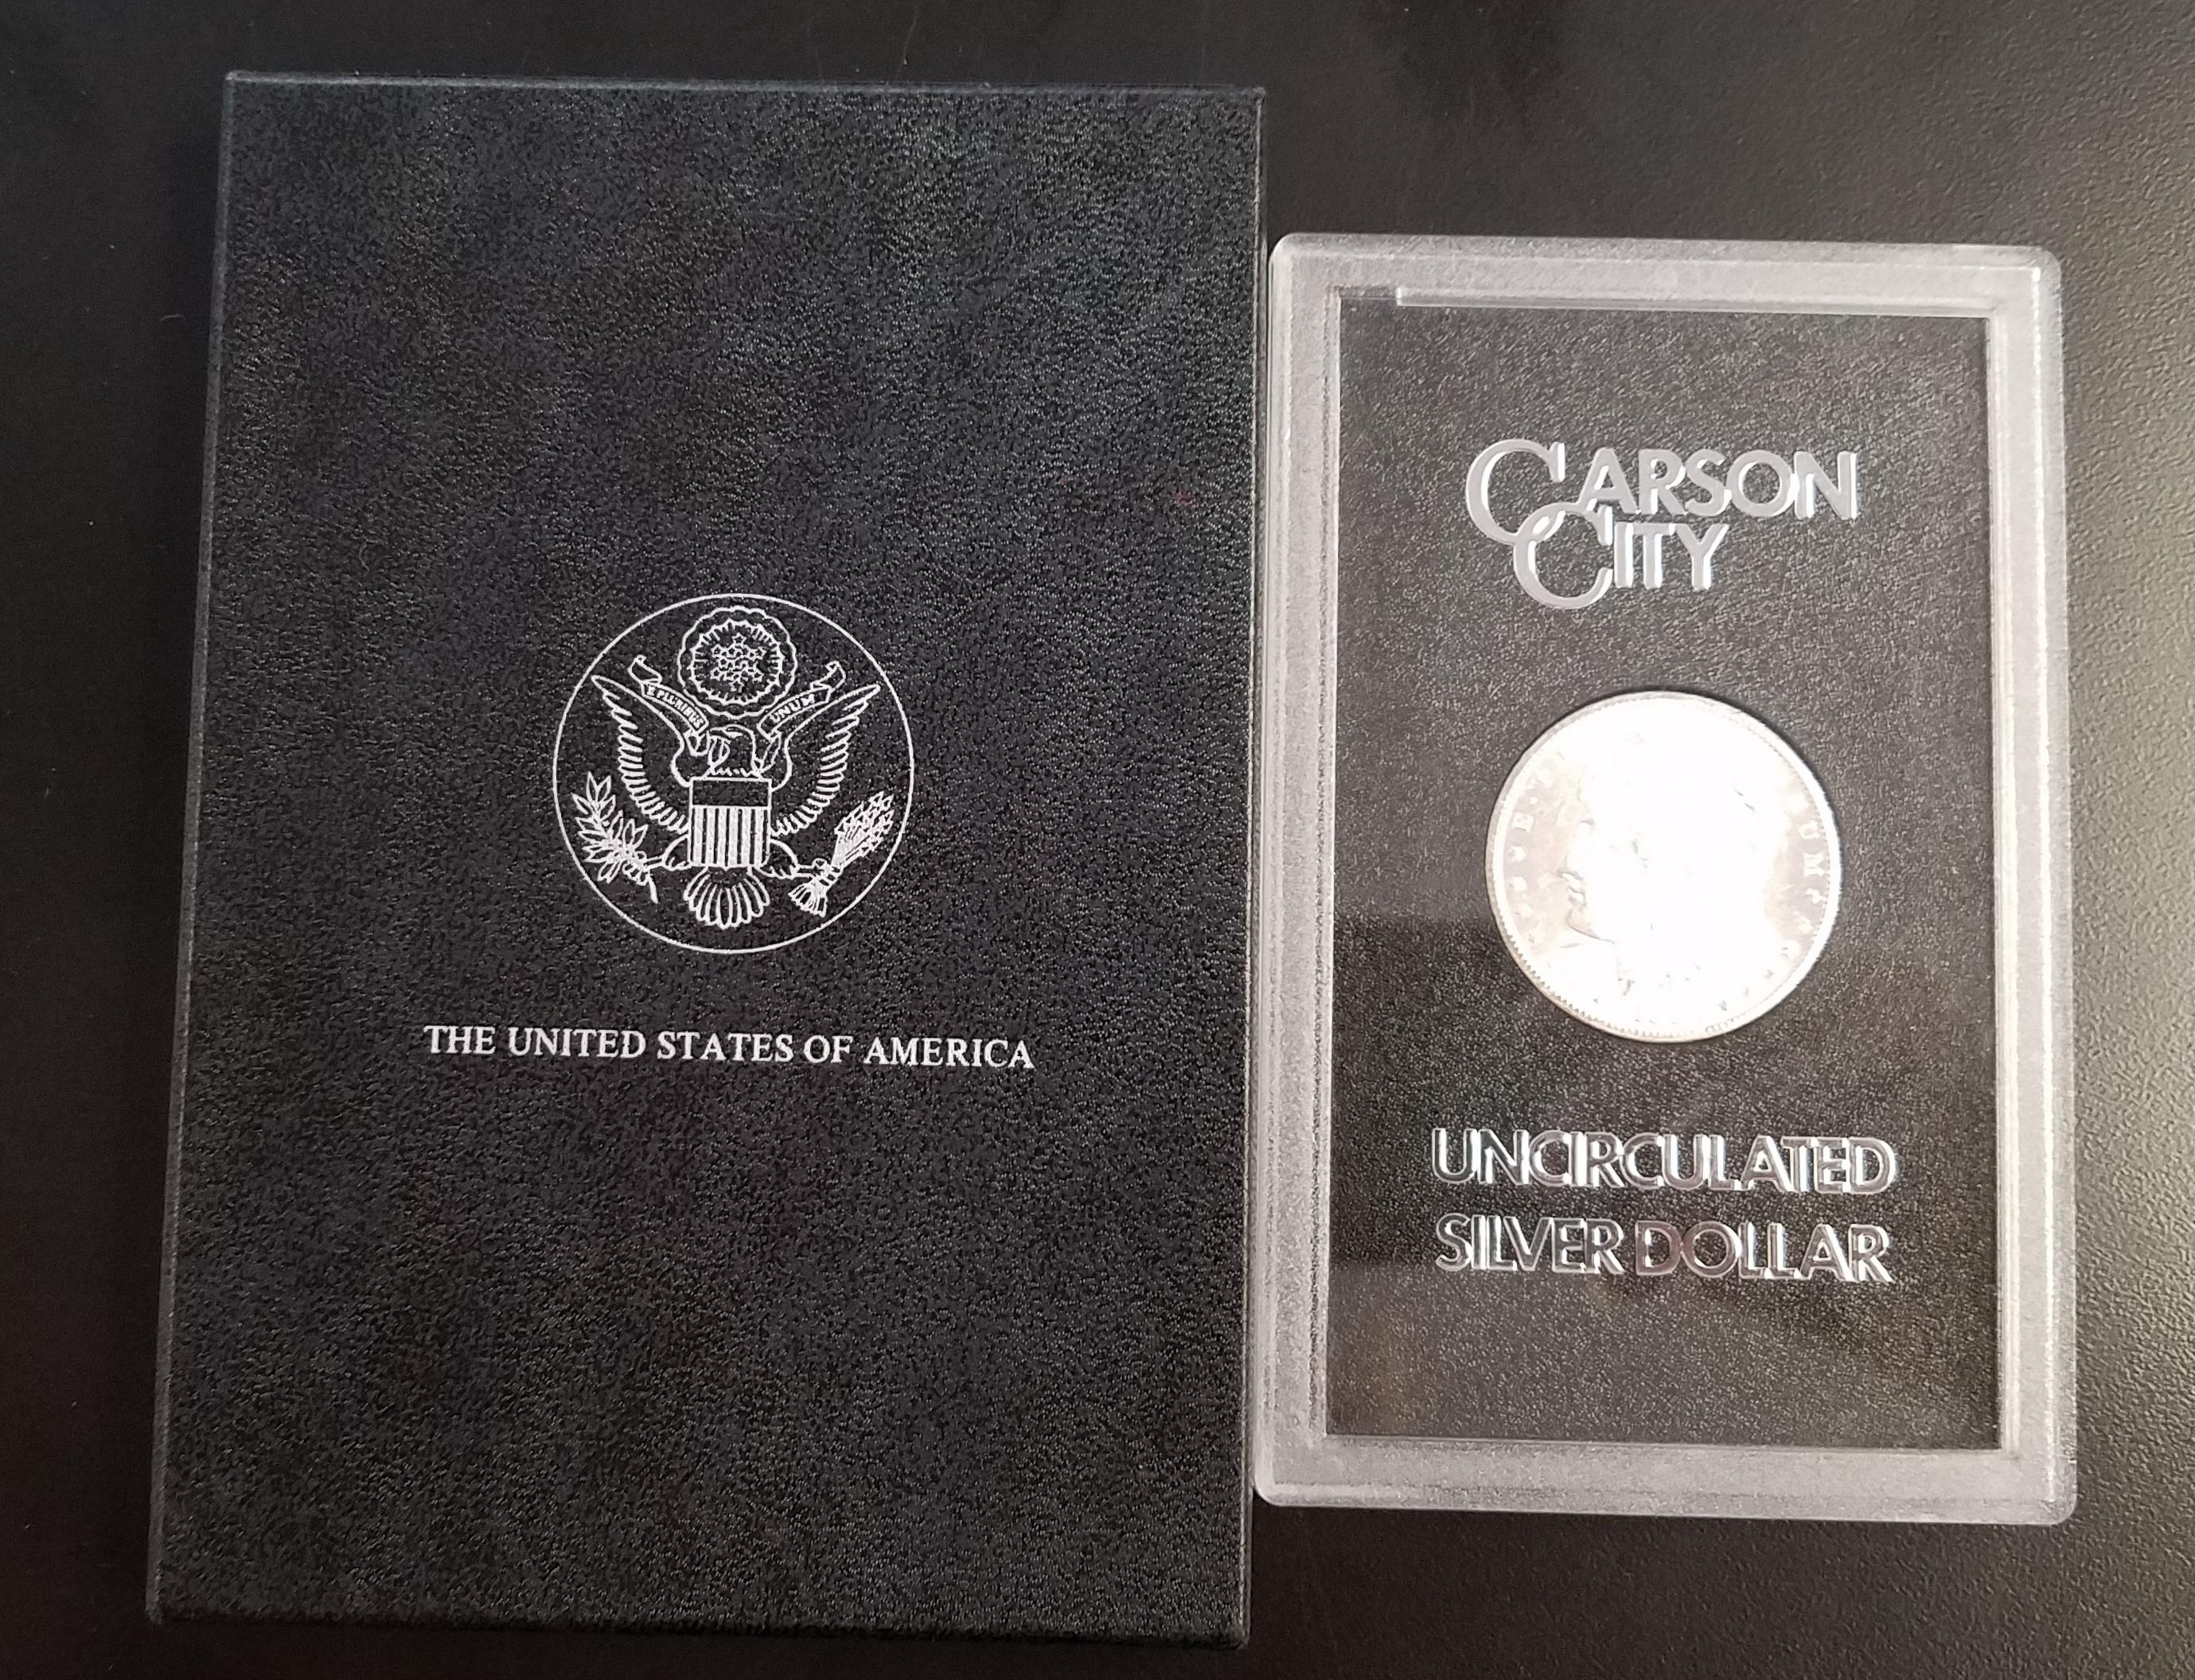 CARSON CITY 1882 UN-CIRCULATED SILVER DOLLAR CURRENCY COINS